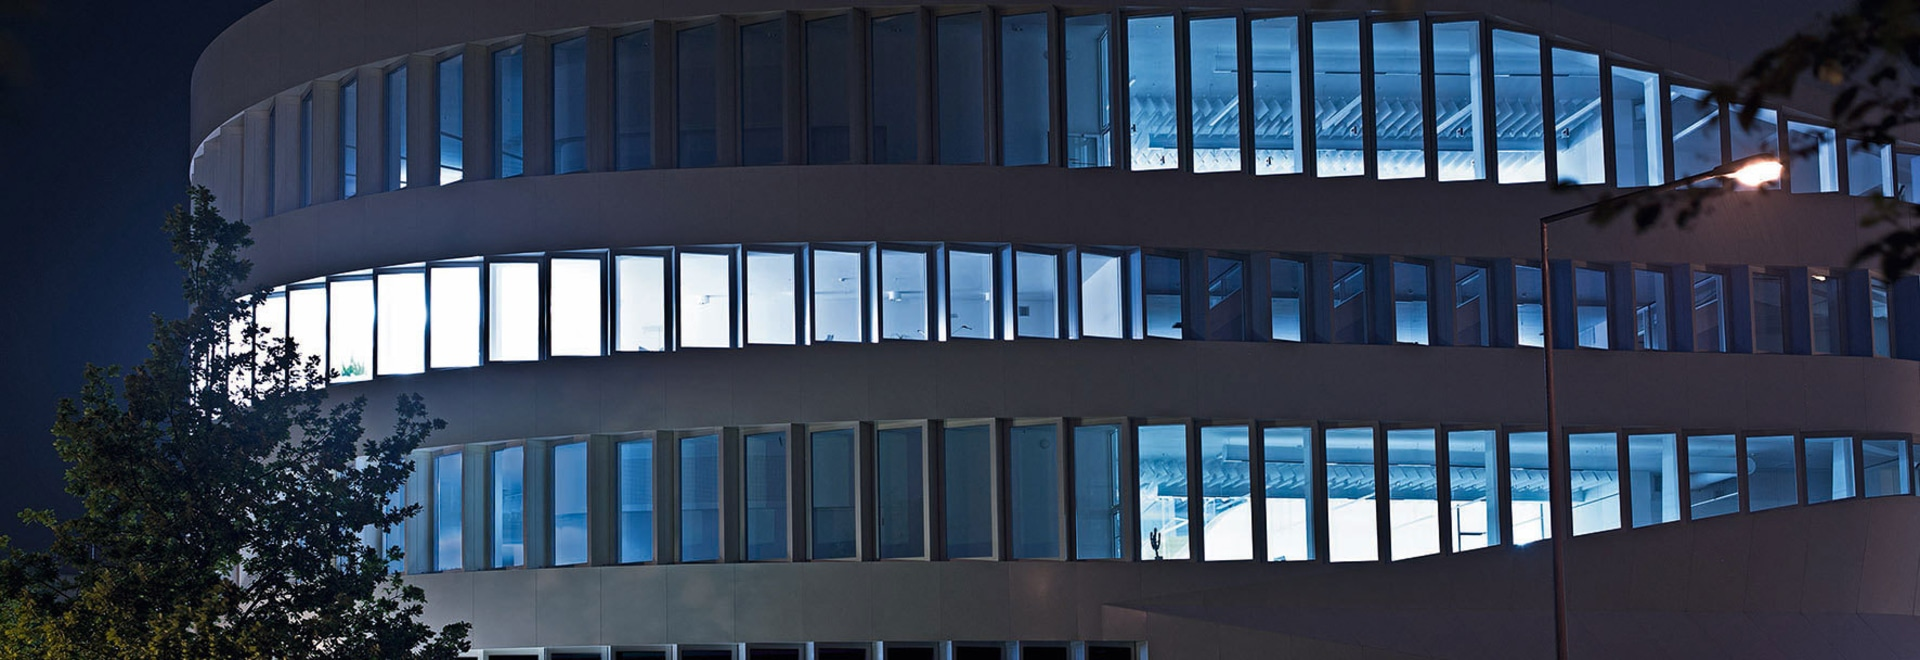 Ingegneria ZVE, organizzazione IAO, Stuttgart, Germania di Virtuelles del für di Zentrum del und di Arbeitswirtschaft del für di Fraunhofer-Institut